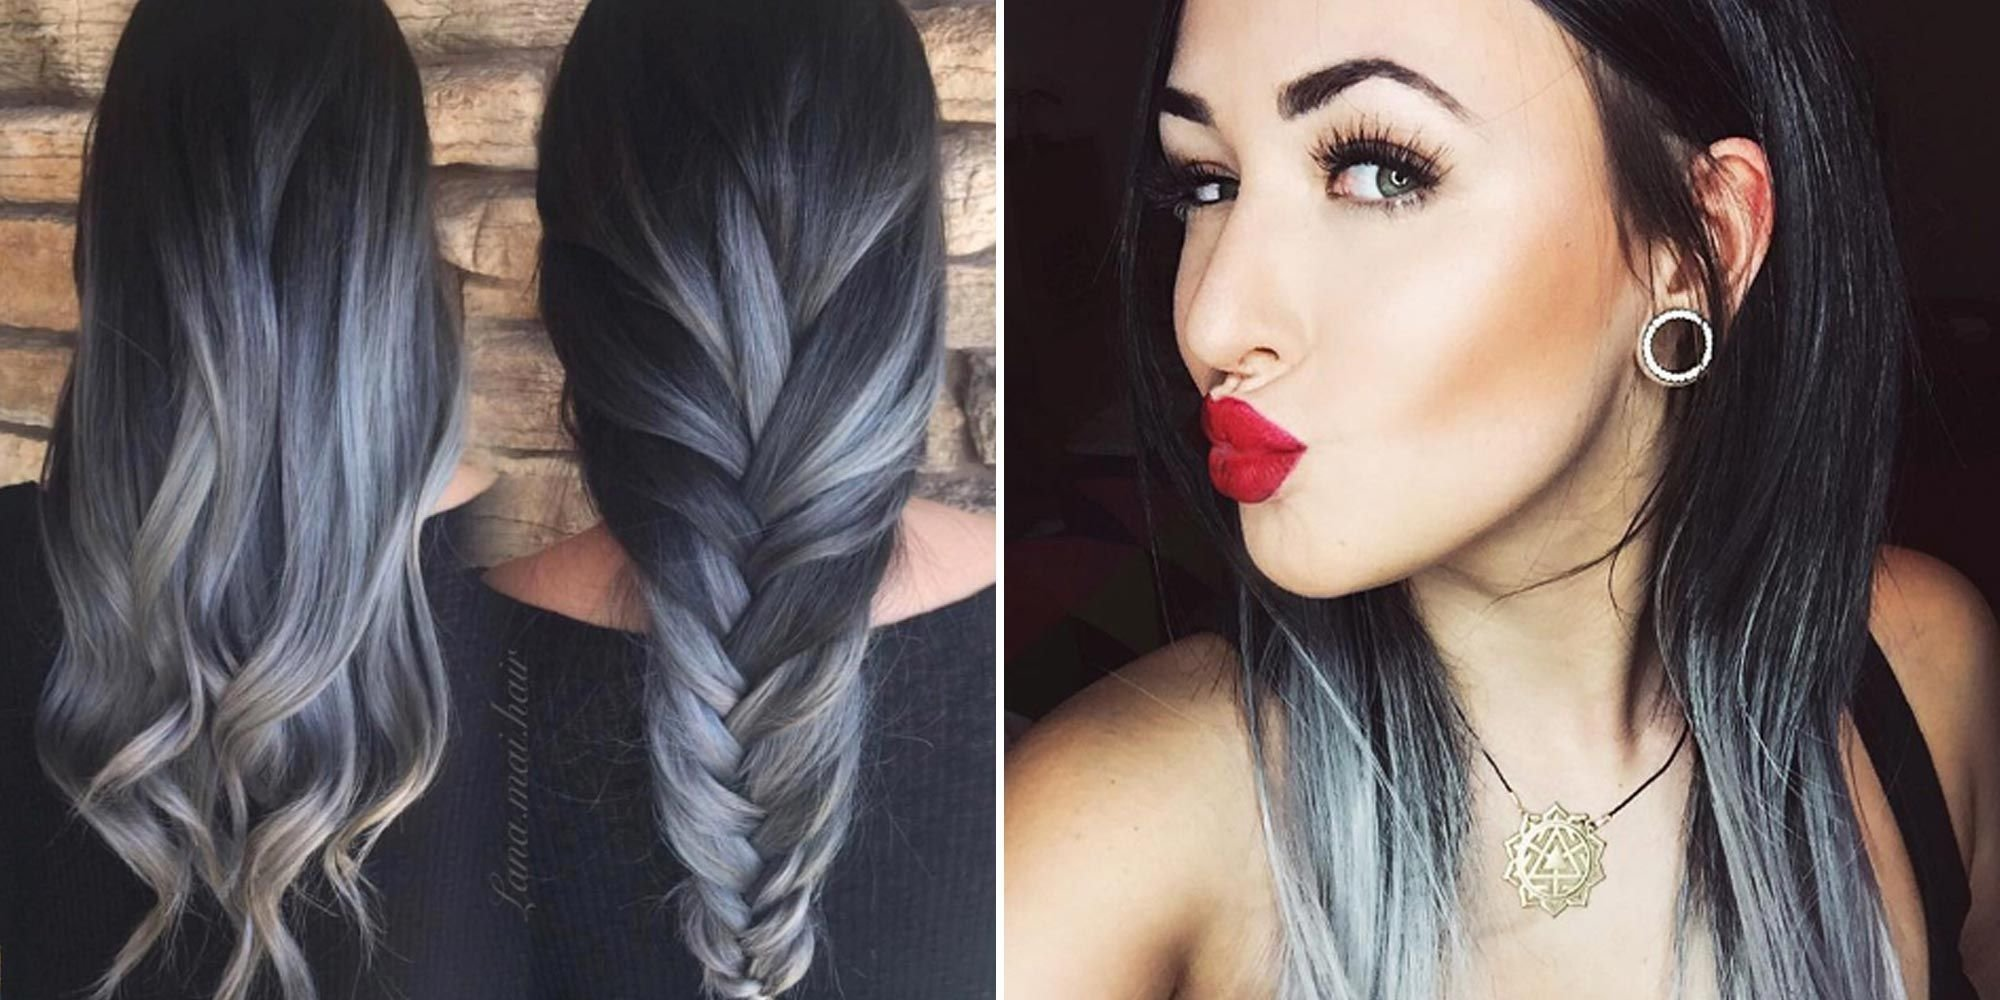 10 Attractive Cute Hair Color Ideas For Dark Hair hair color ideas for 2018 best hair colors cosmopolitan 1 2020